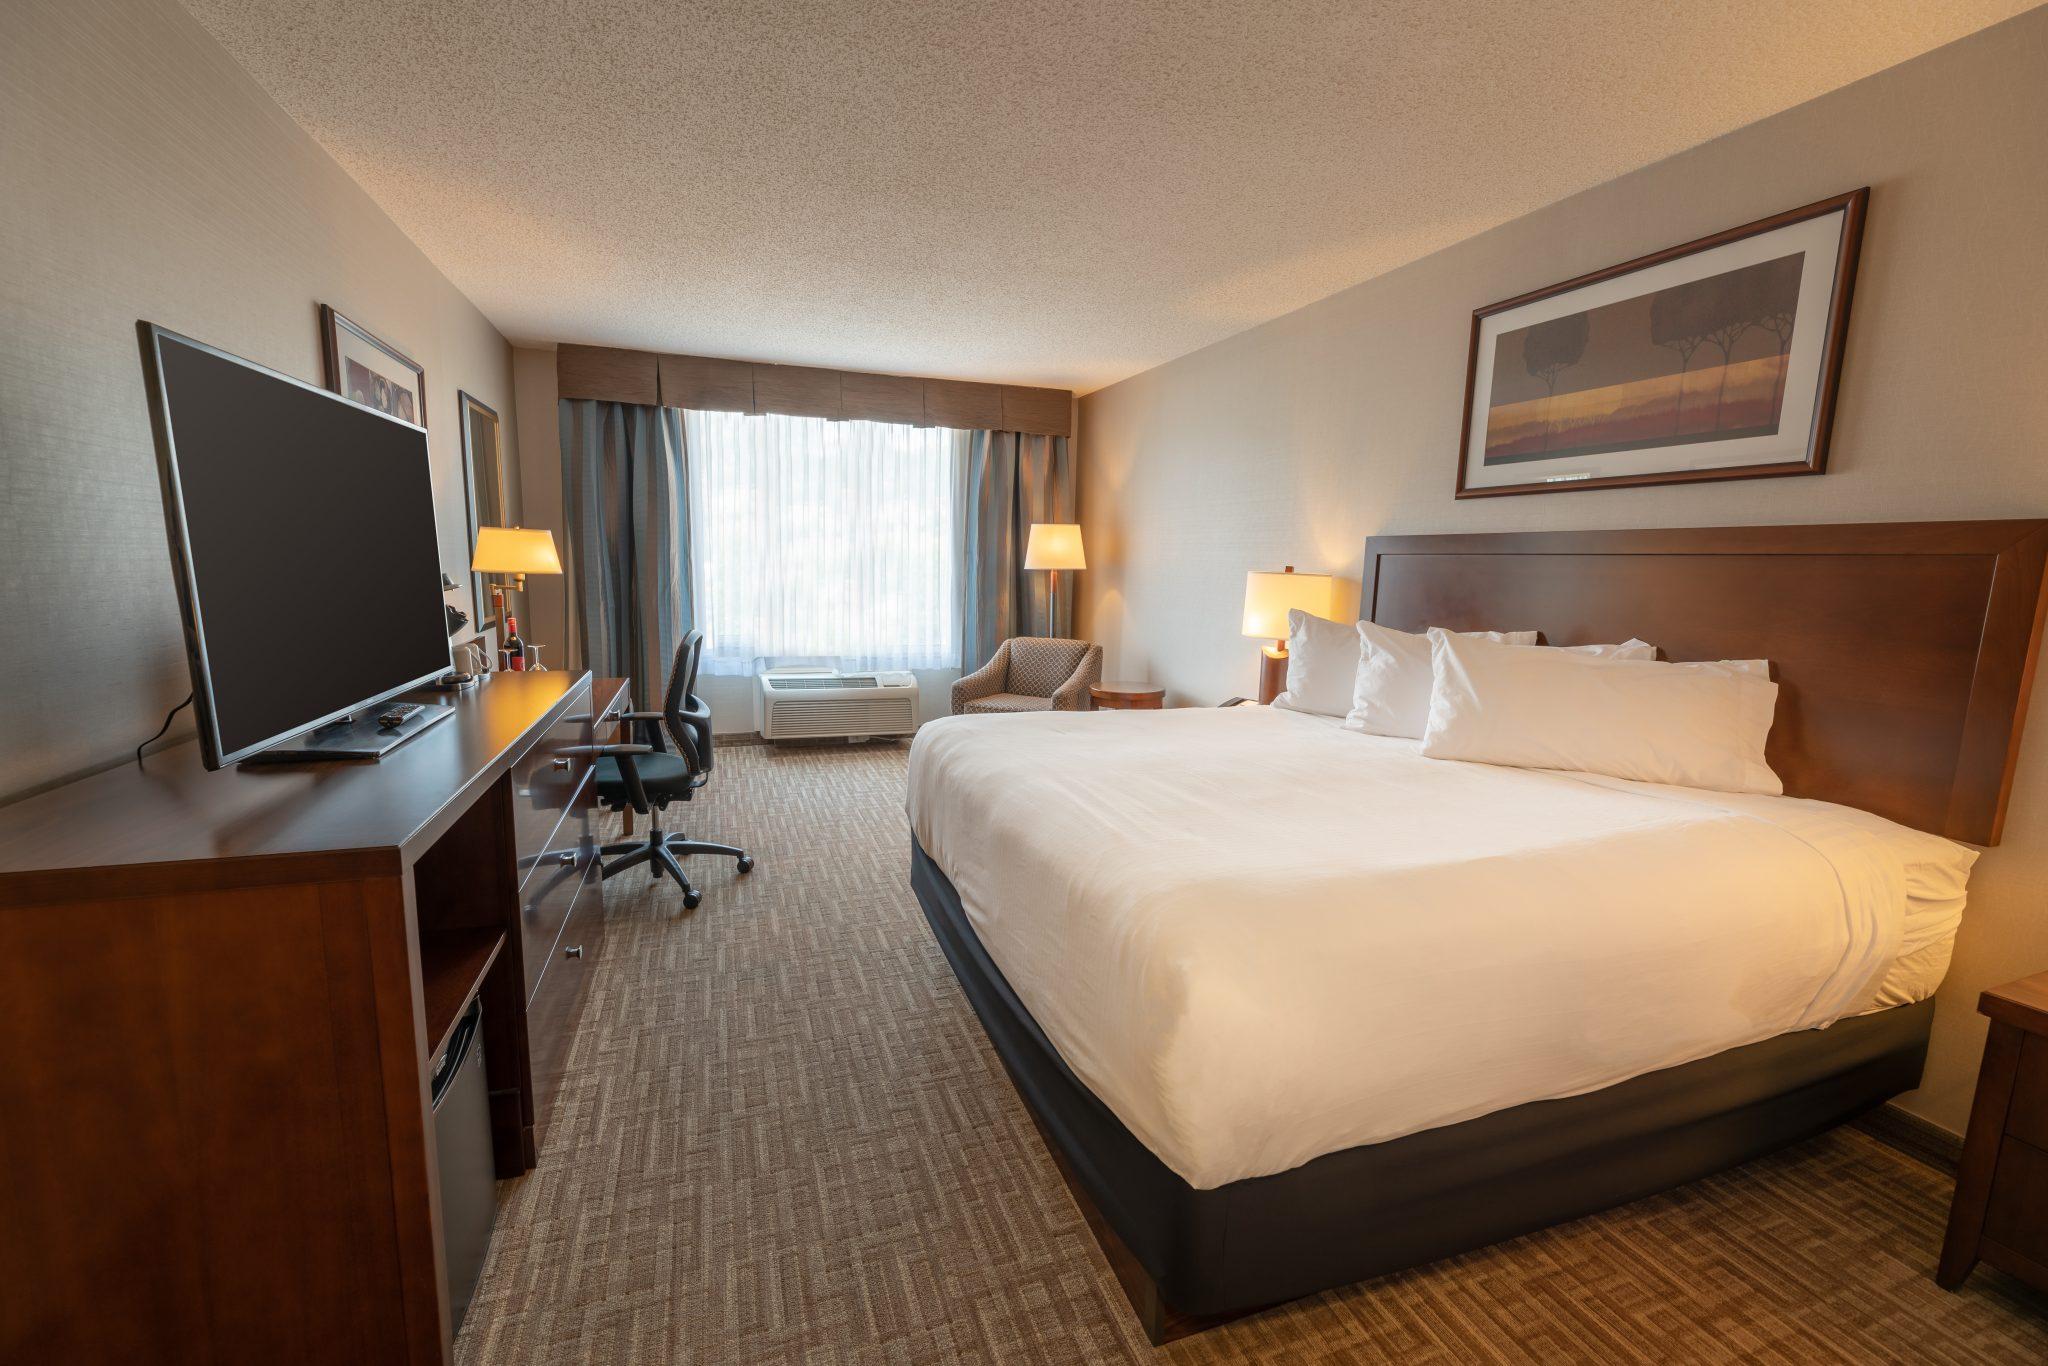 hotel in kelowna Kanata Inns Kelowna Deluxe King